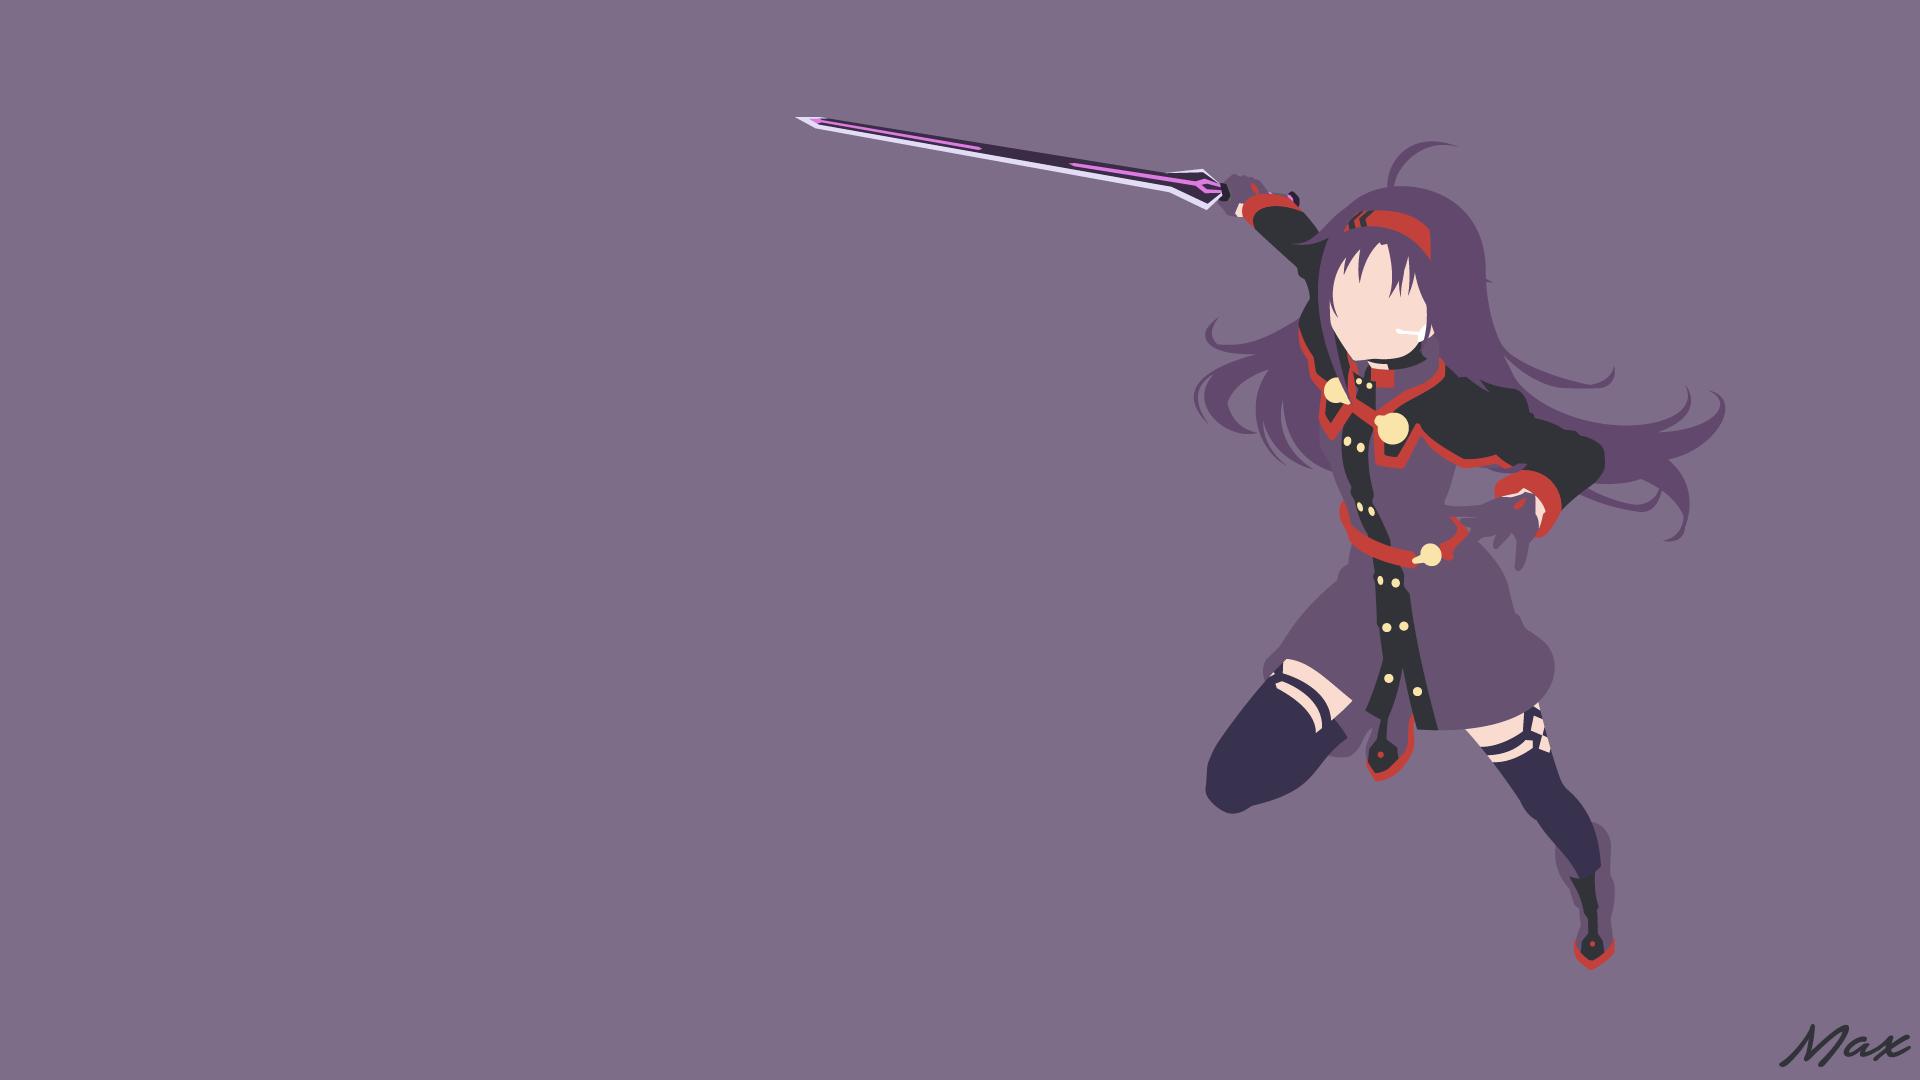 Sword art online by max028 on deviantart for Minimal art online